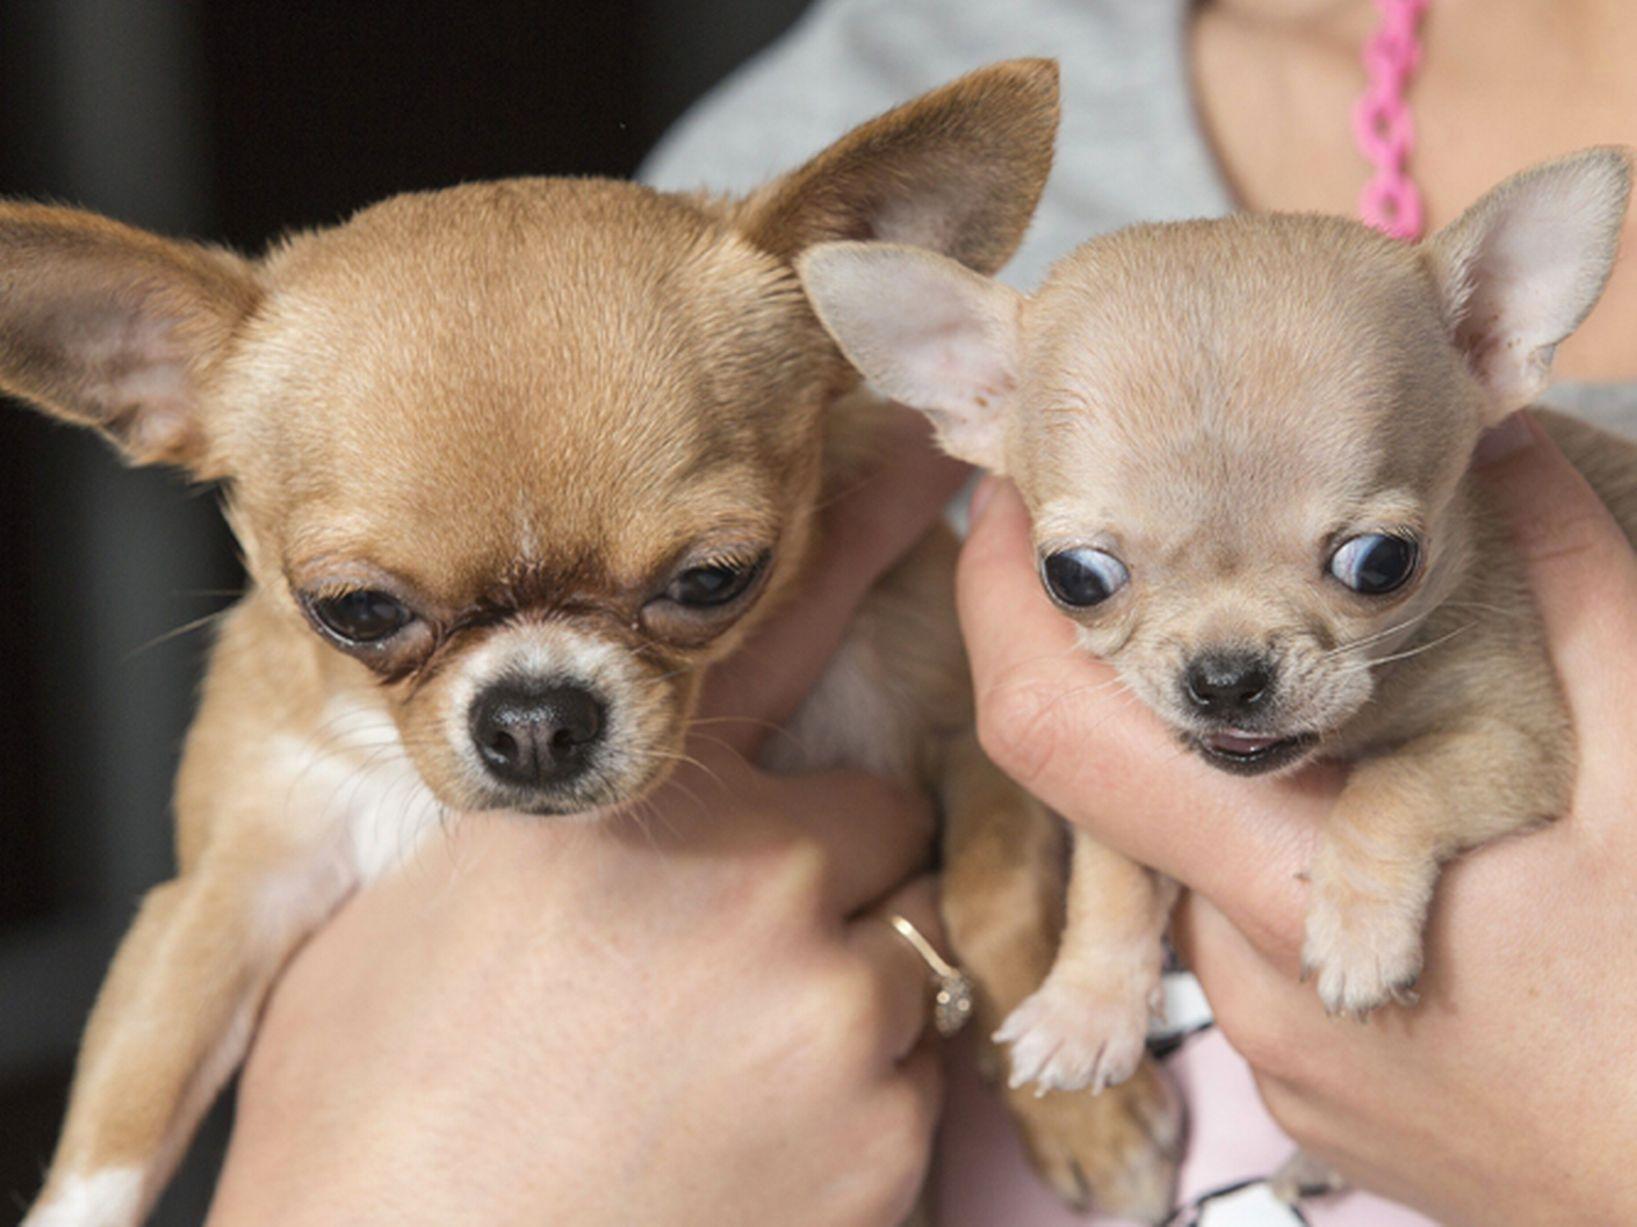 Toudi, the world's smallest dog (chihuahua)